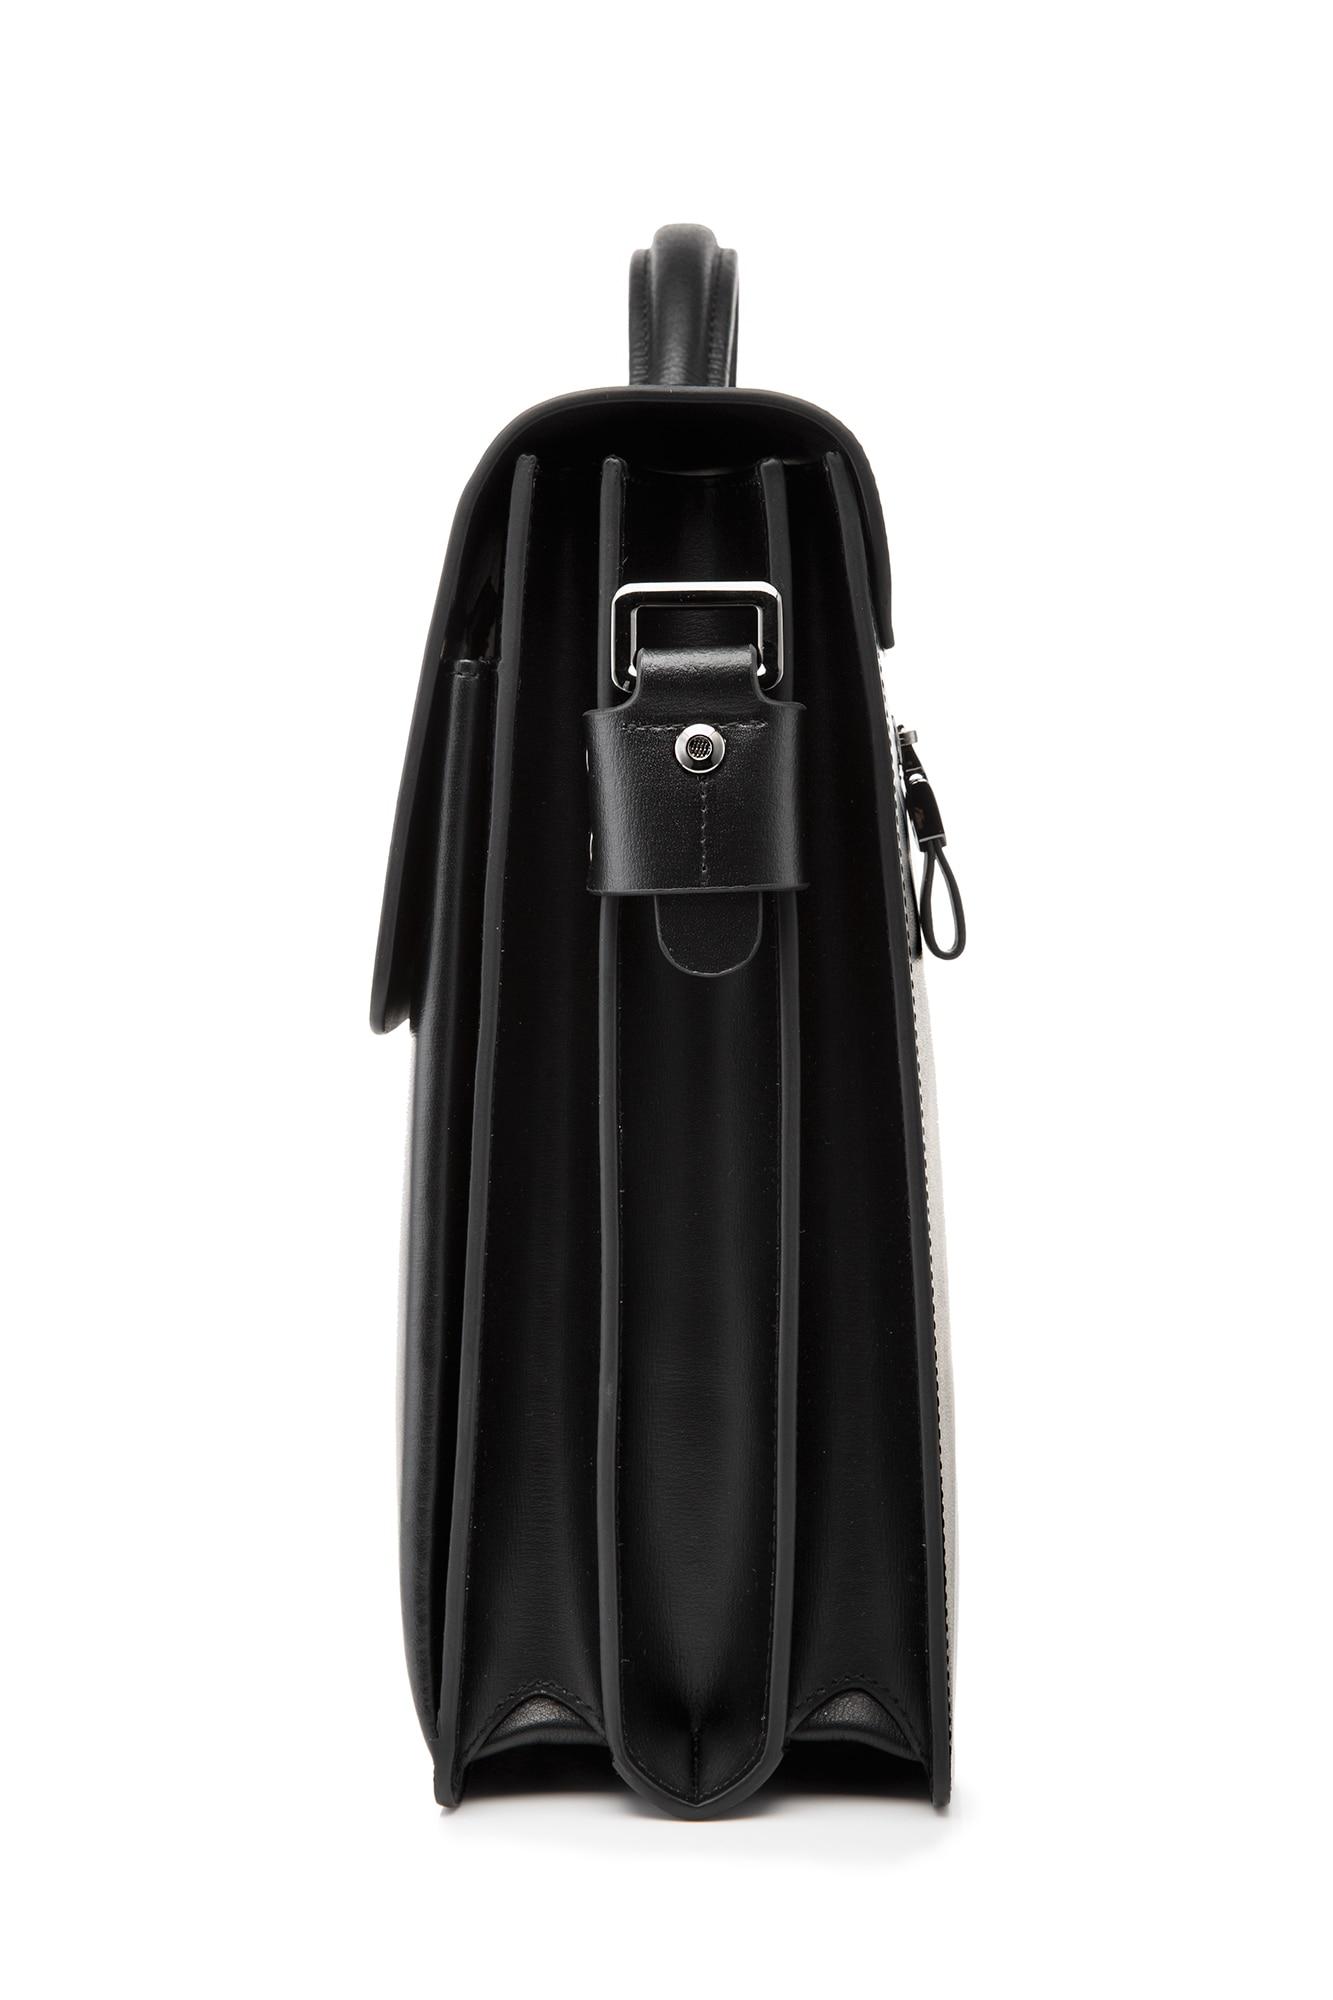 YINTE kožna crna torba muška aktovka velika i deblja torba torbica - Aktovke - Foto 4